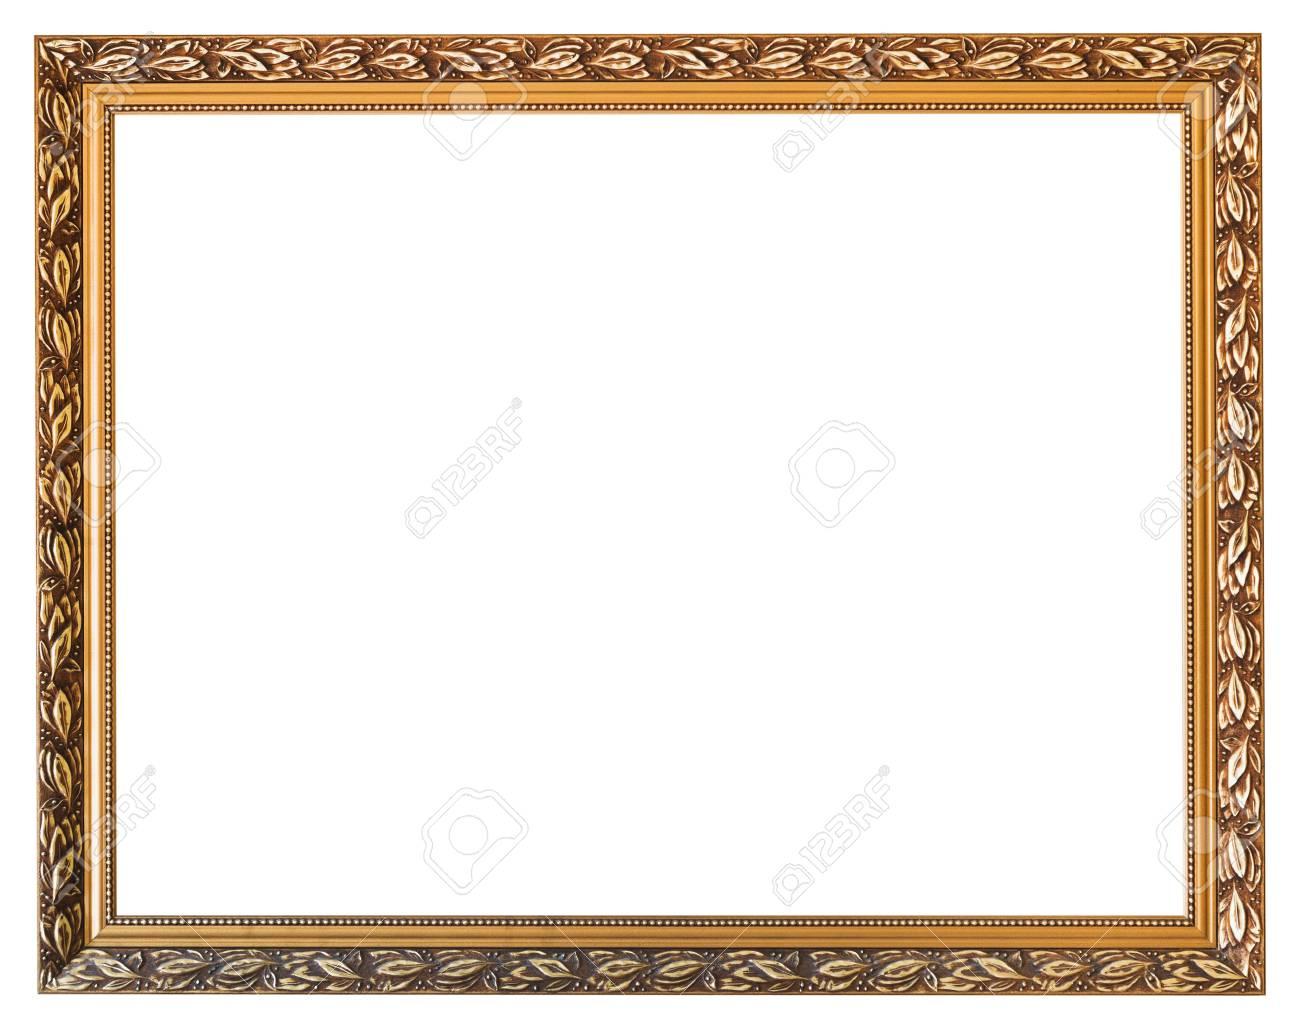 Geschnitzten Goldenen Bilderrahmen Aus Holz Mit Ausgeschnitten ...